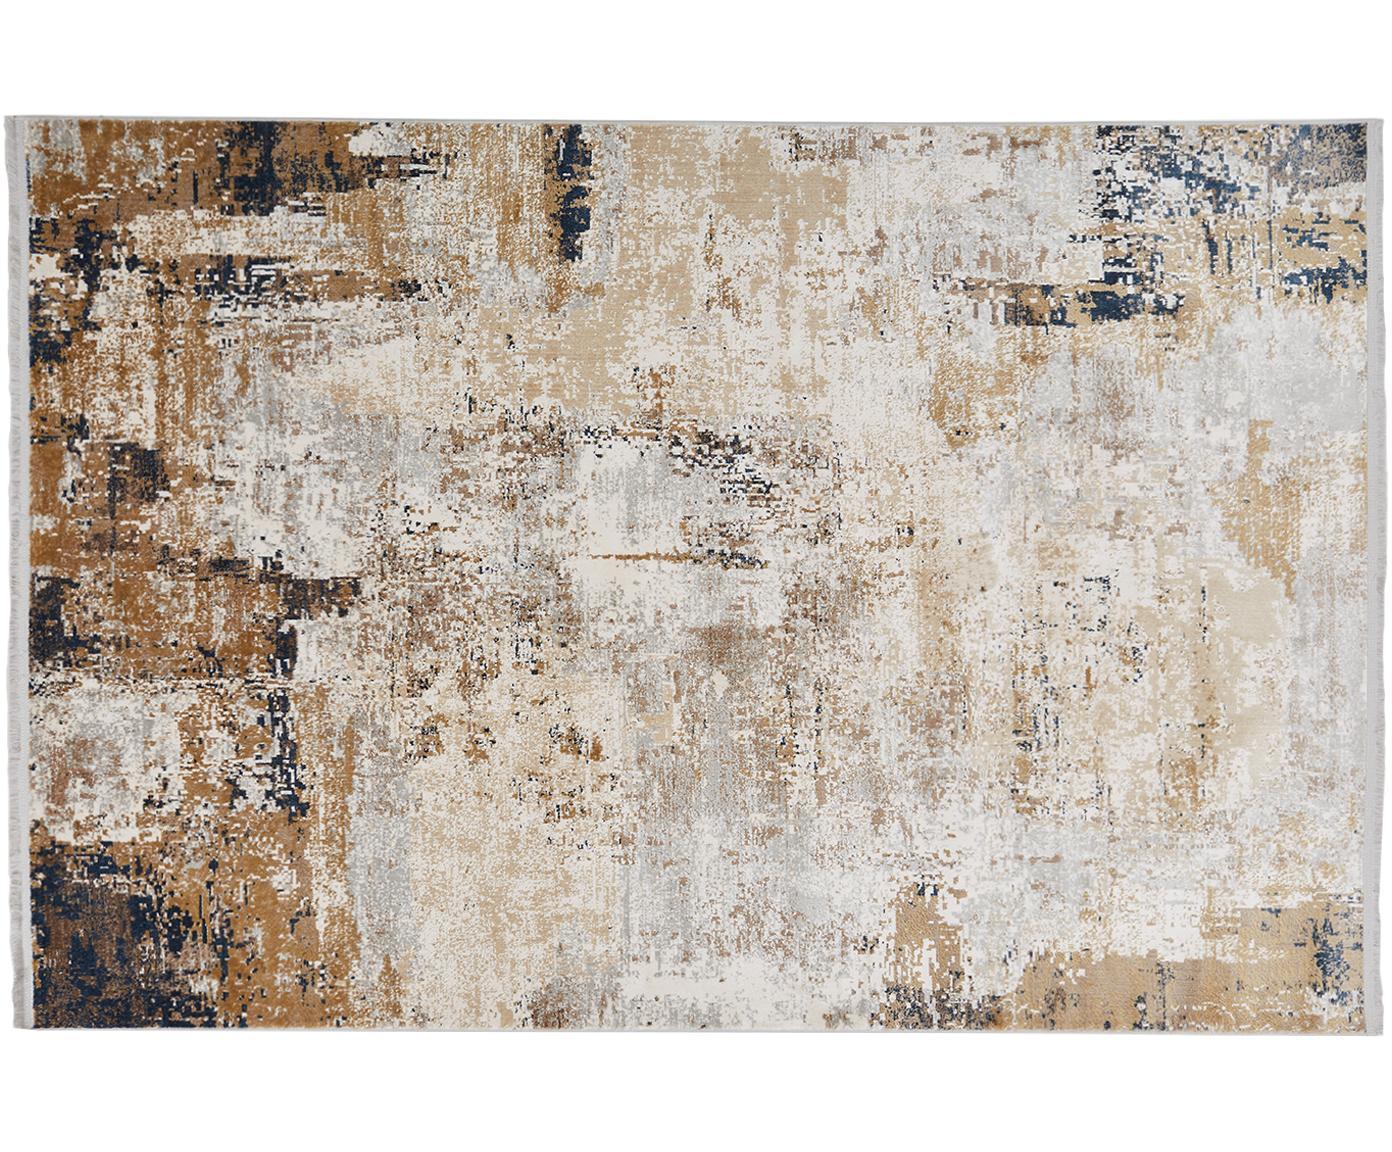 Teppich Verona mit abstraktem Muster, Flor: Viskose, Acryl, Creme, Beige, Grau, Braun, Dunkelblau, B 80 x L 150 cm (Größe XS)